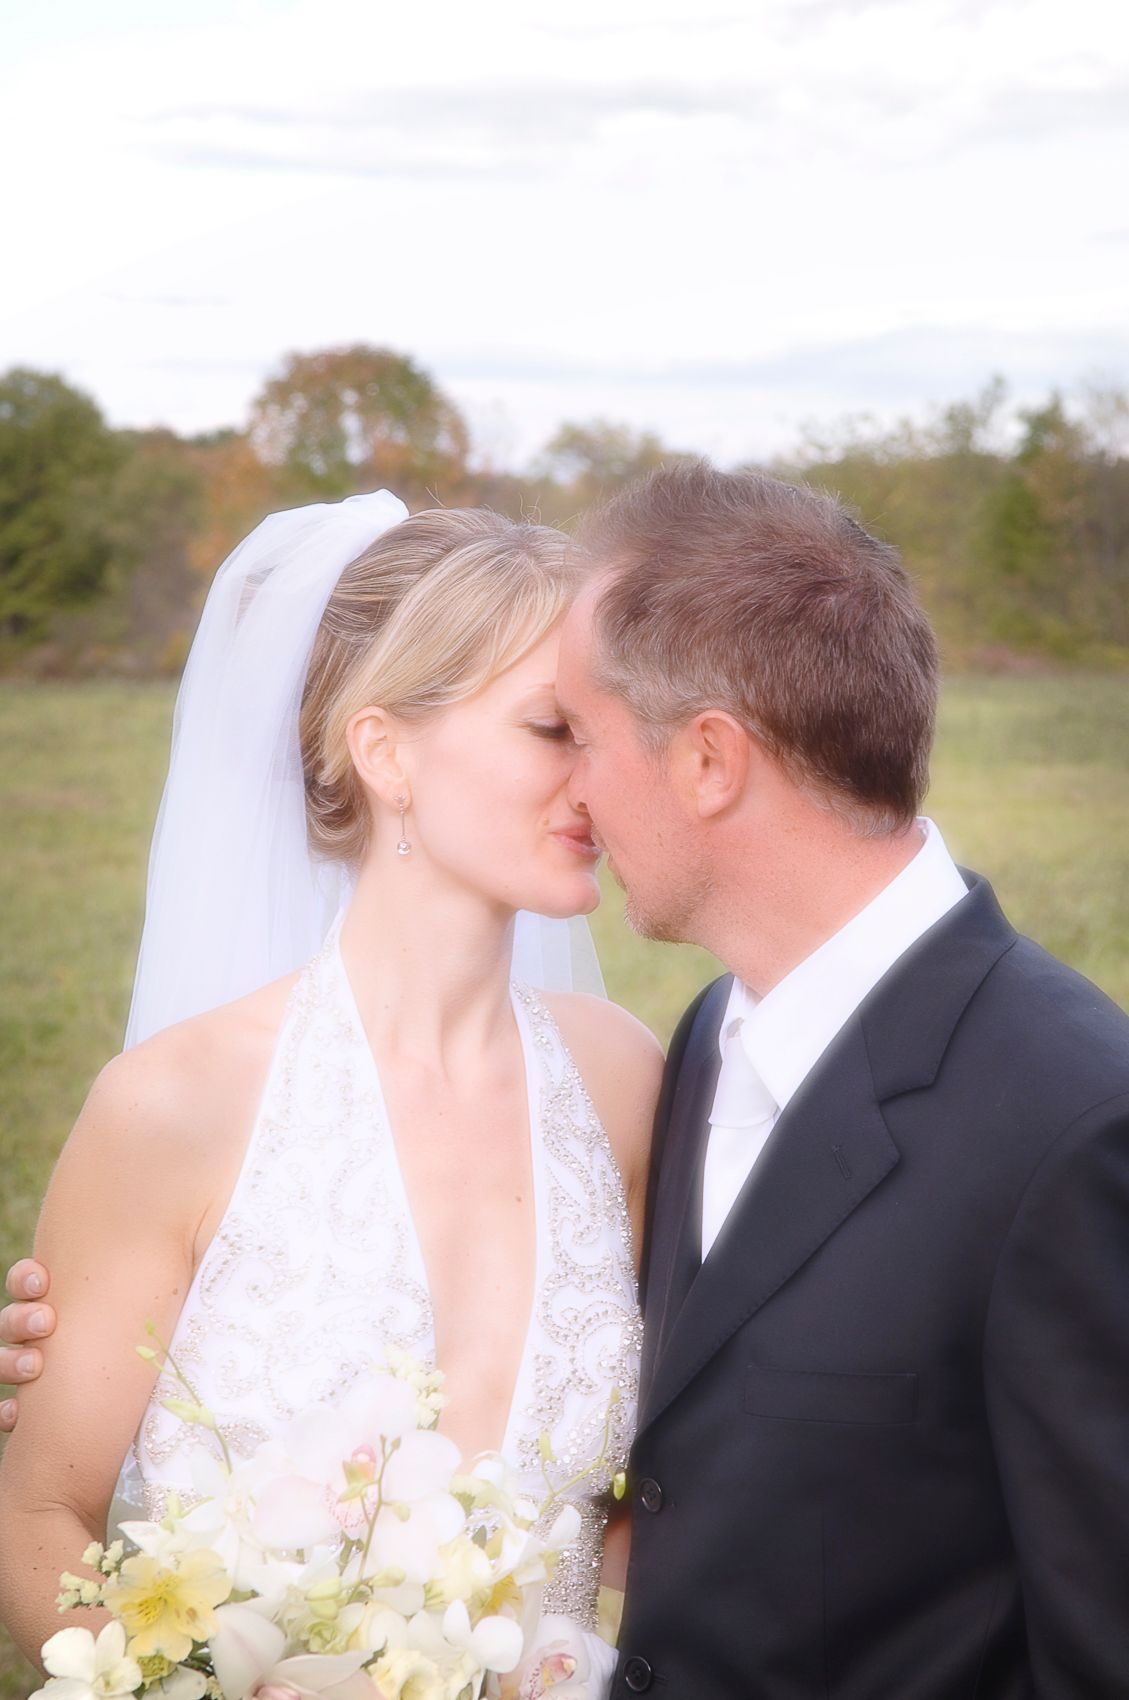 West_Hartford_Connecticut_Wedding_Photography-008.jpg